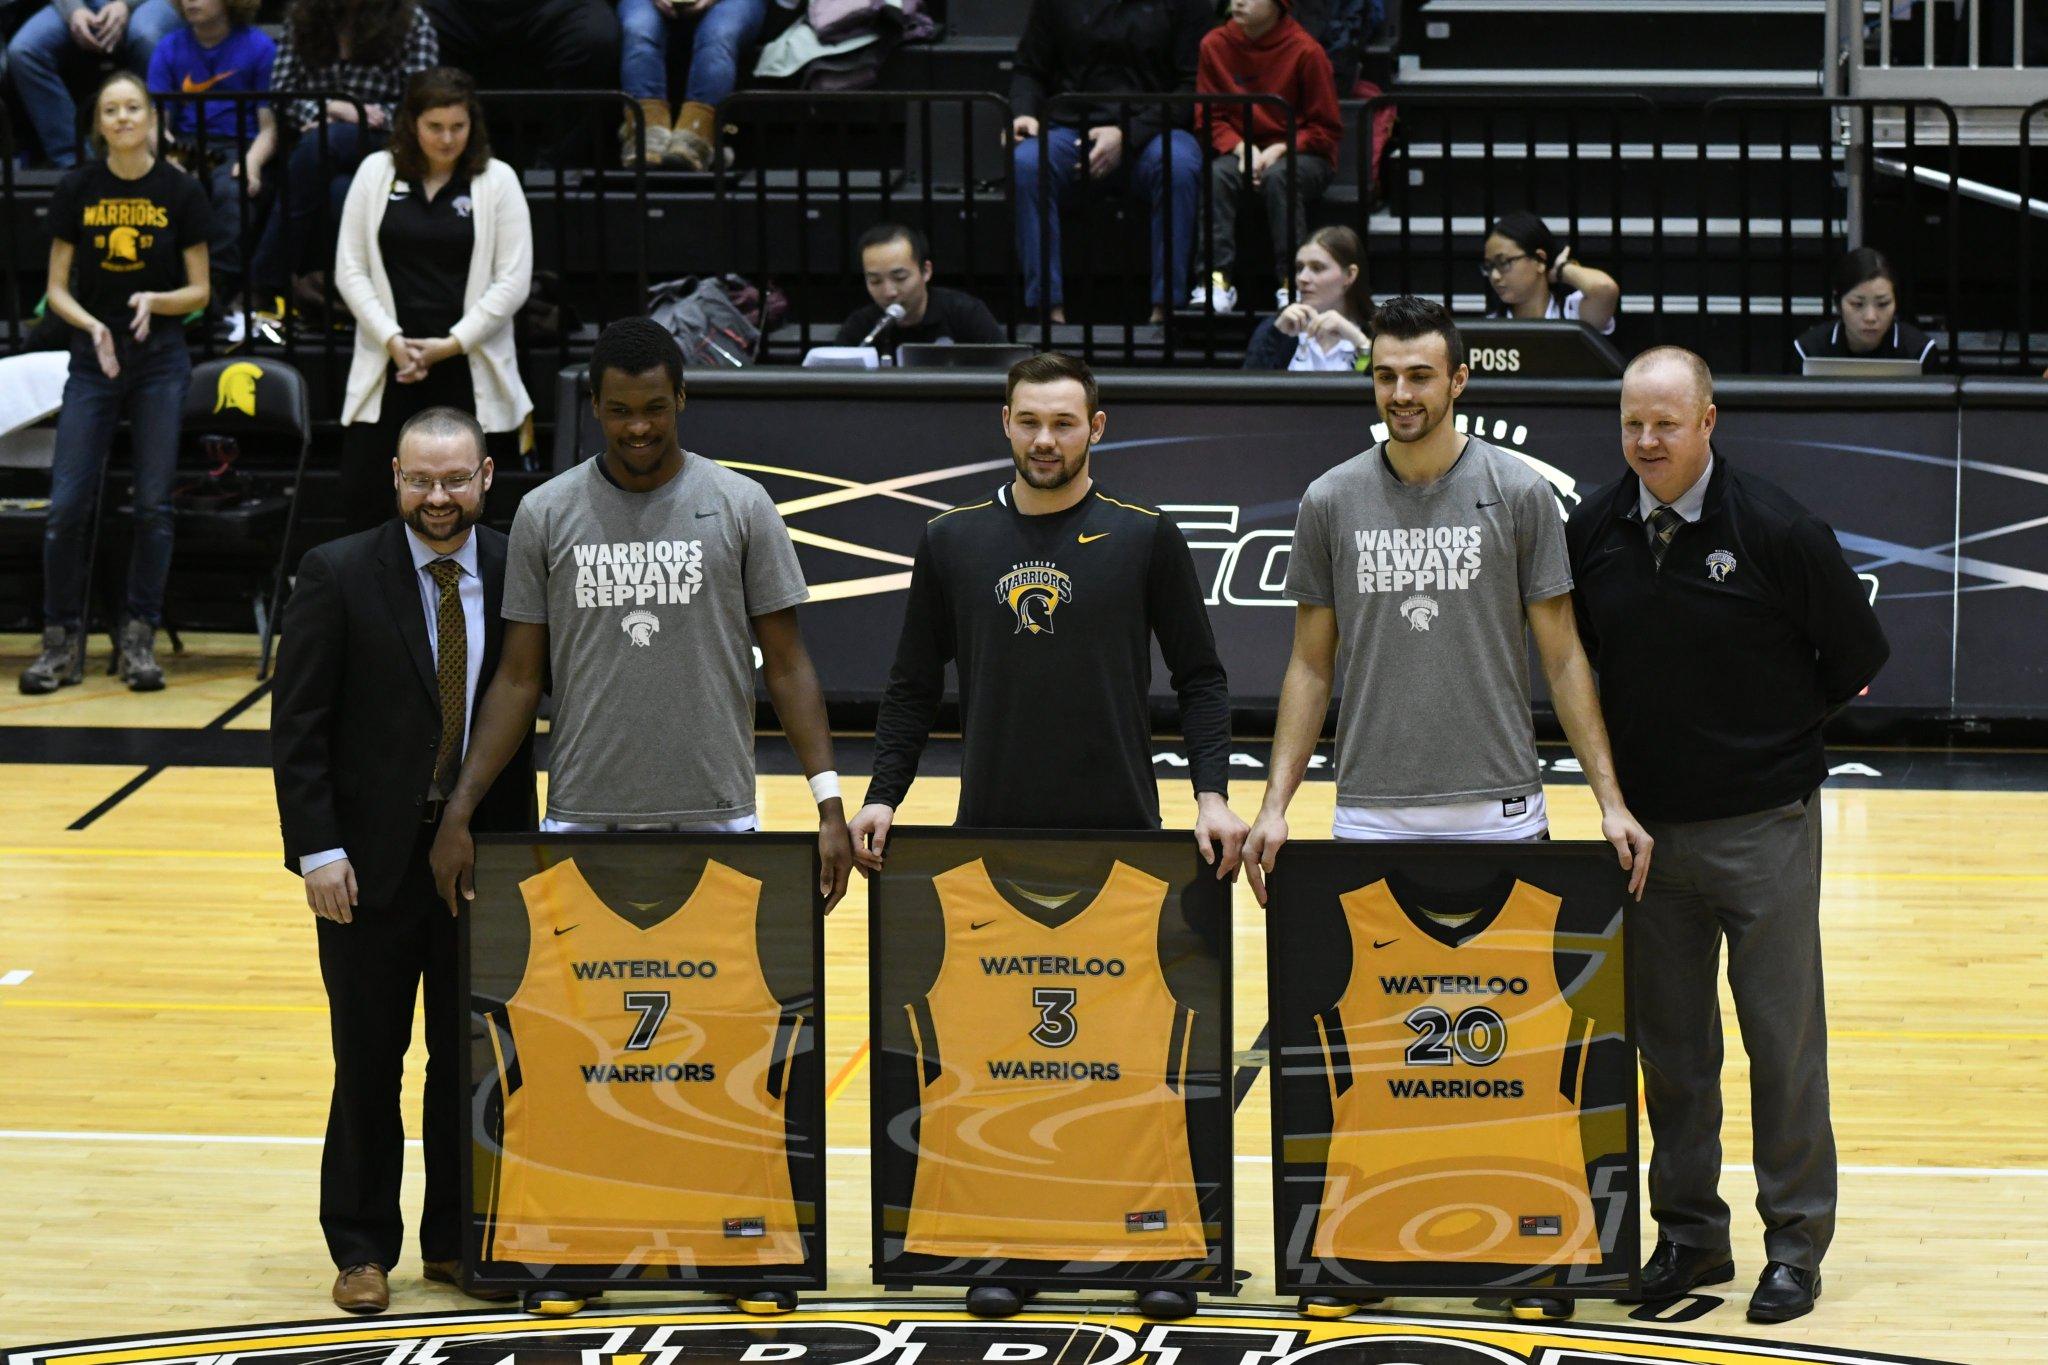 Seniors honoured at #UWaterlooFAD @WlooWarriors mens basketball game.  #7 Ben Davis, #3 Jon Ravenhorst, and #20 Mike Pereira. https://t.co/coDxxA6mhg